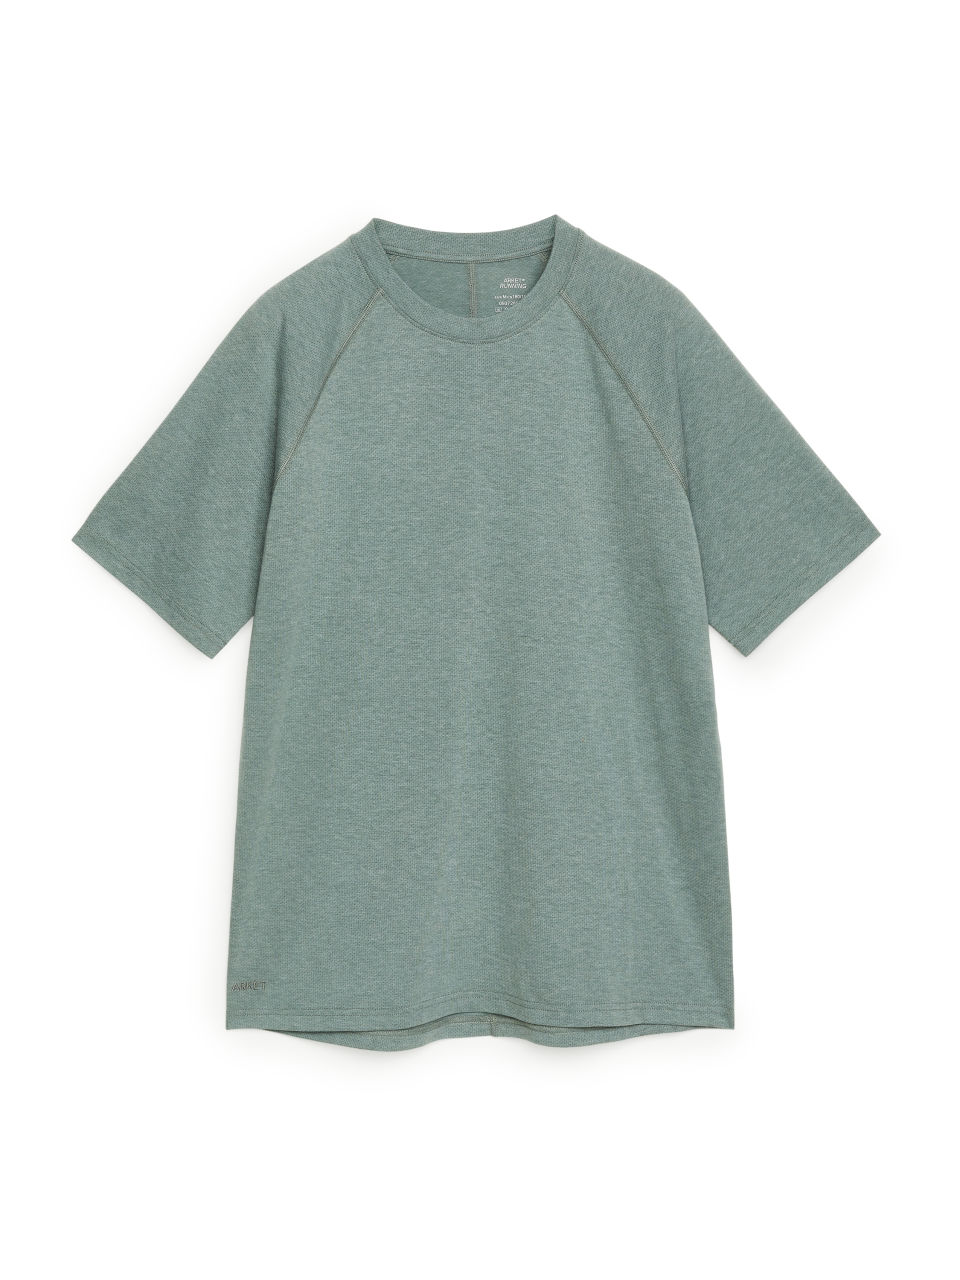 Short Sleeve Training T-Shirt - Green